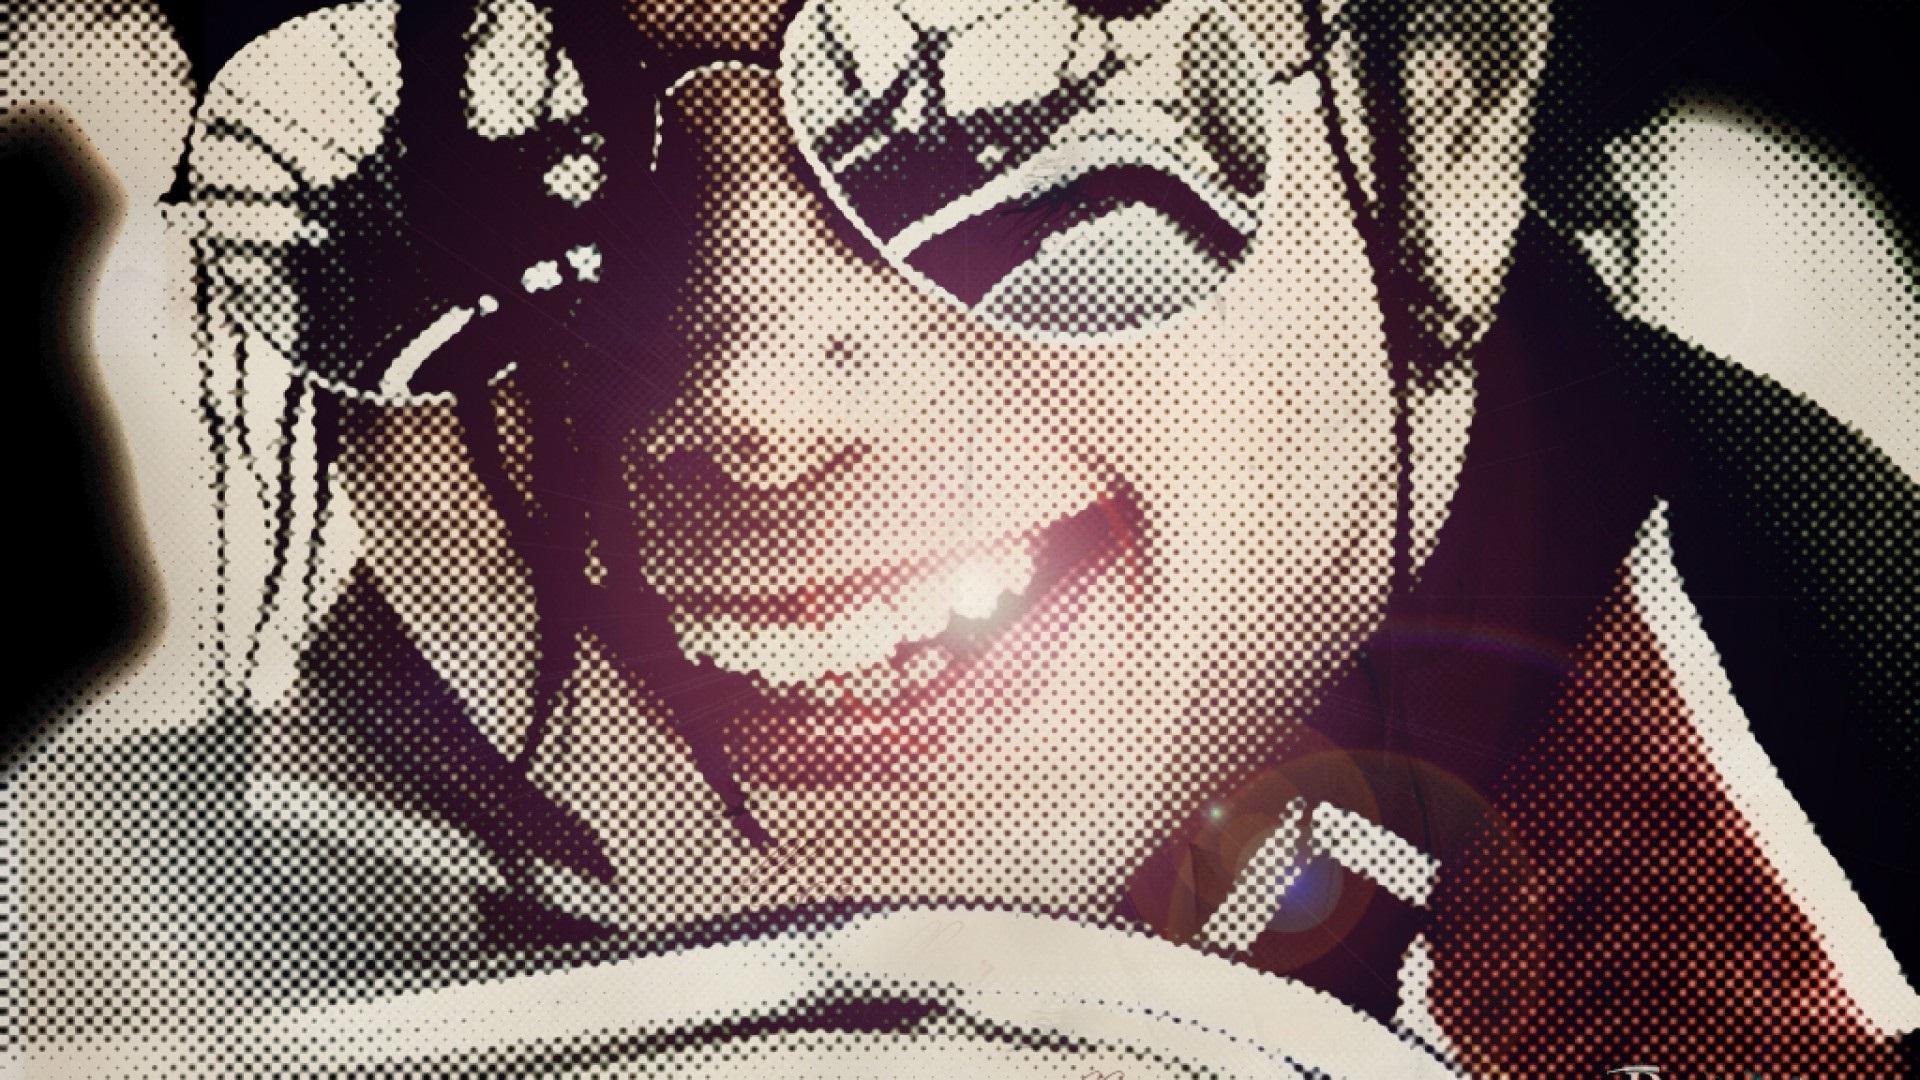 Michael Jackson Wallpapers HD creative